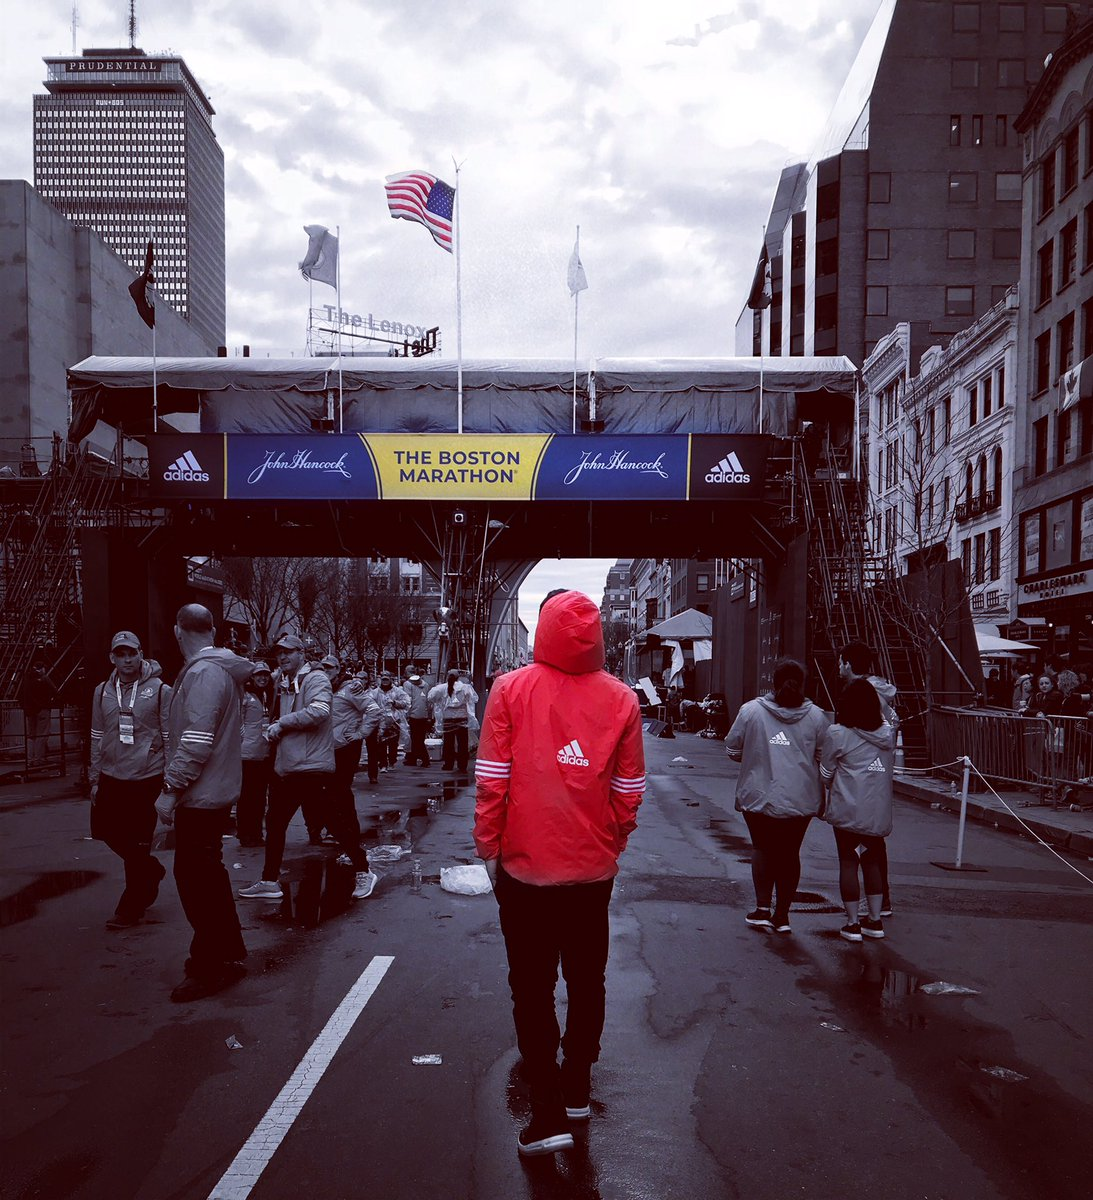 Thankful to be apart of the medical team for the 123rd Boston Marathon  #BostonStrong  #MarathonMonday<br>http://pic.twitter.com/3tzaCrk1qA